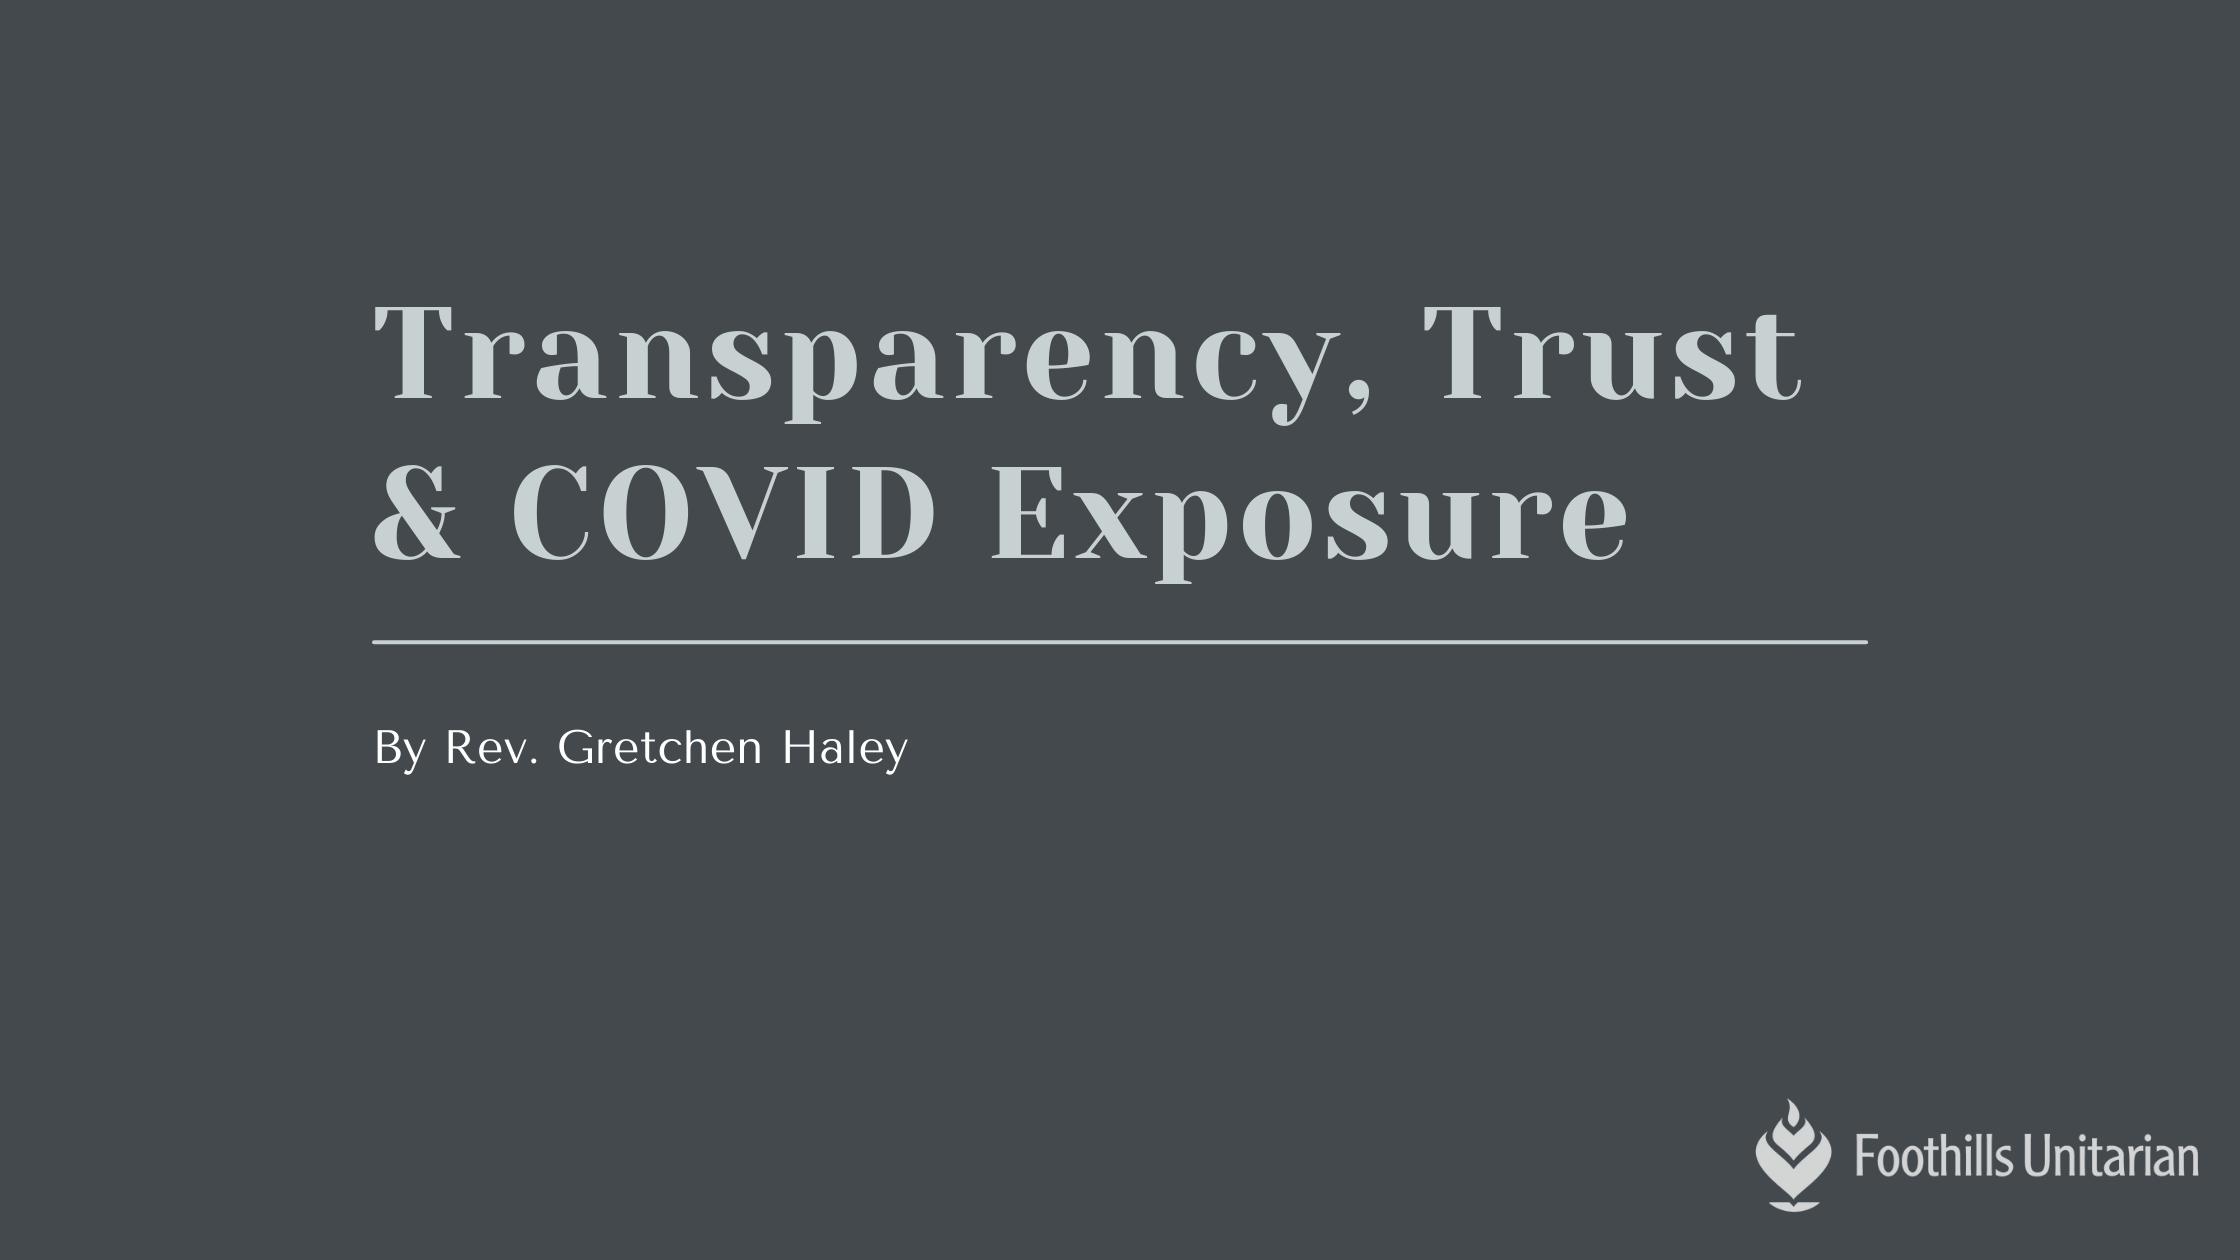 Transparency, Trust & Covid Exposure